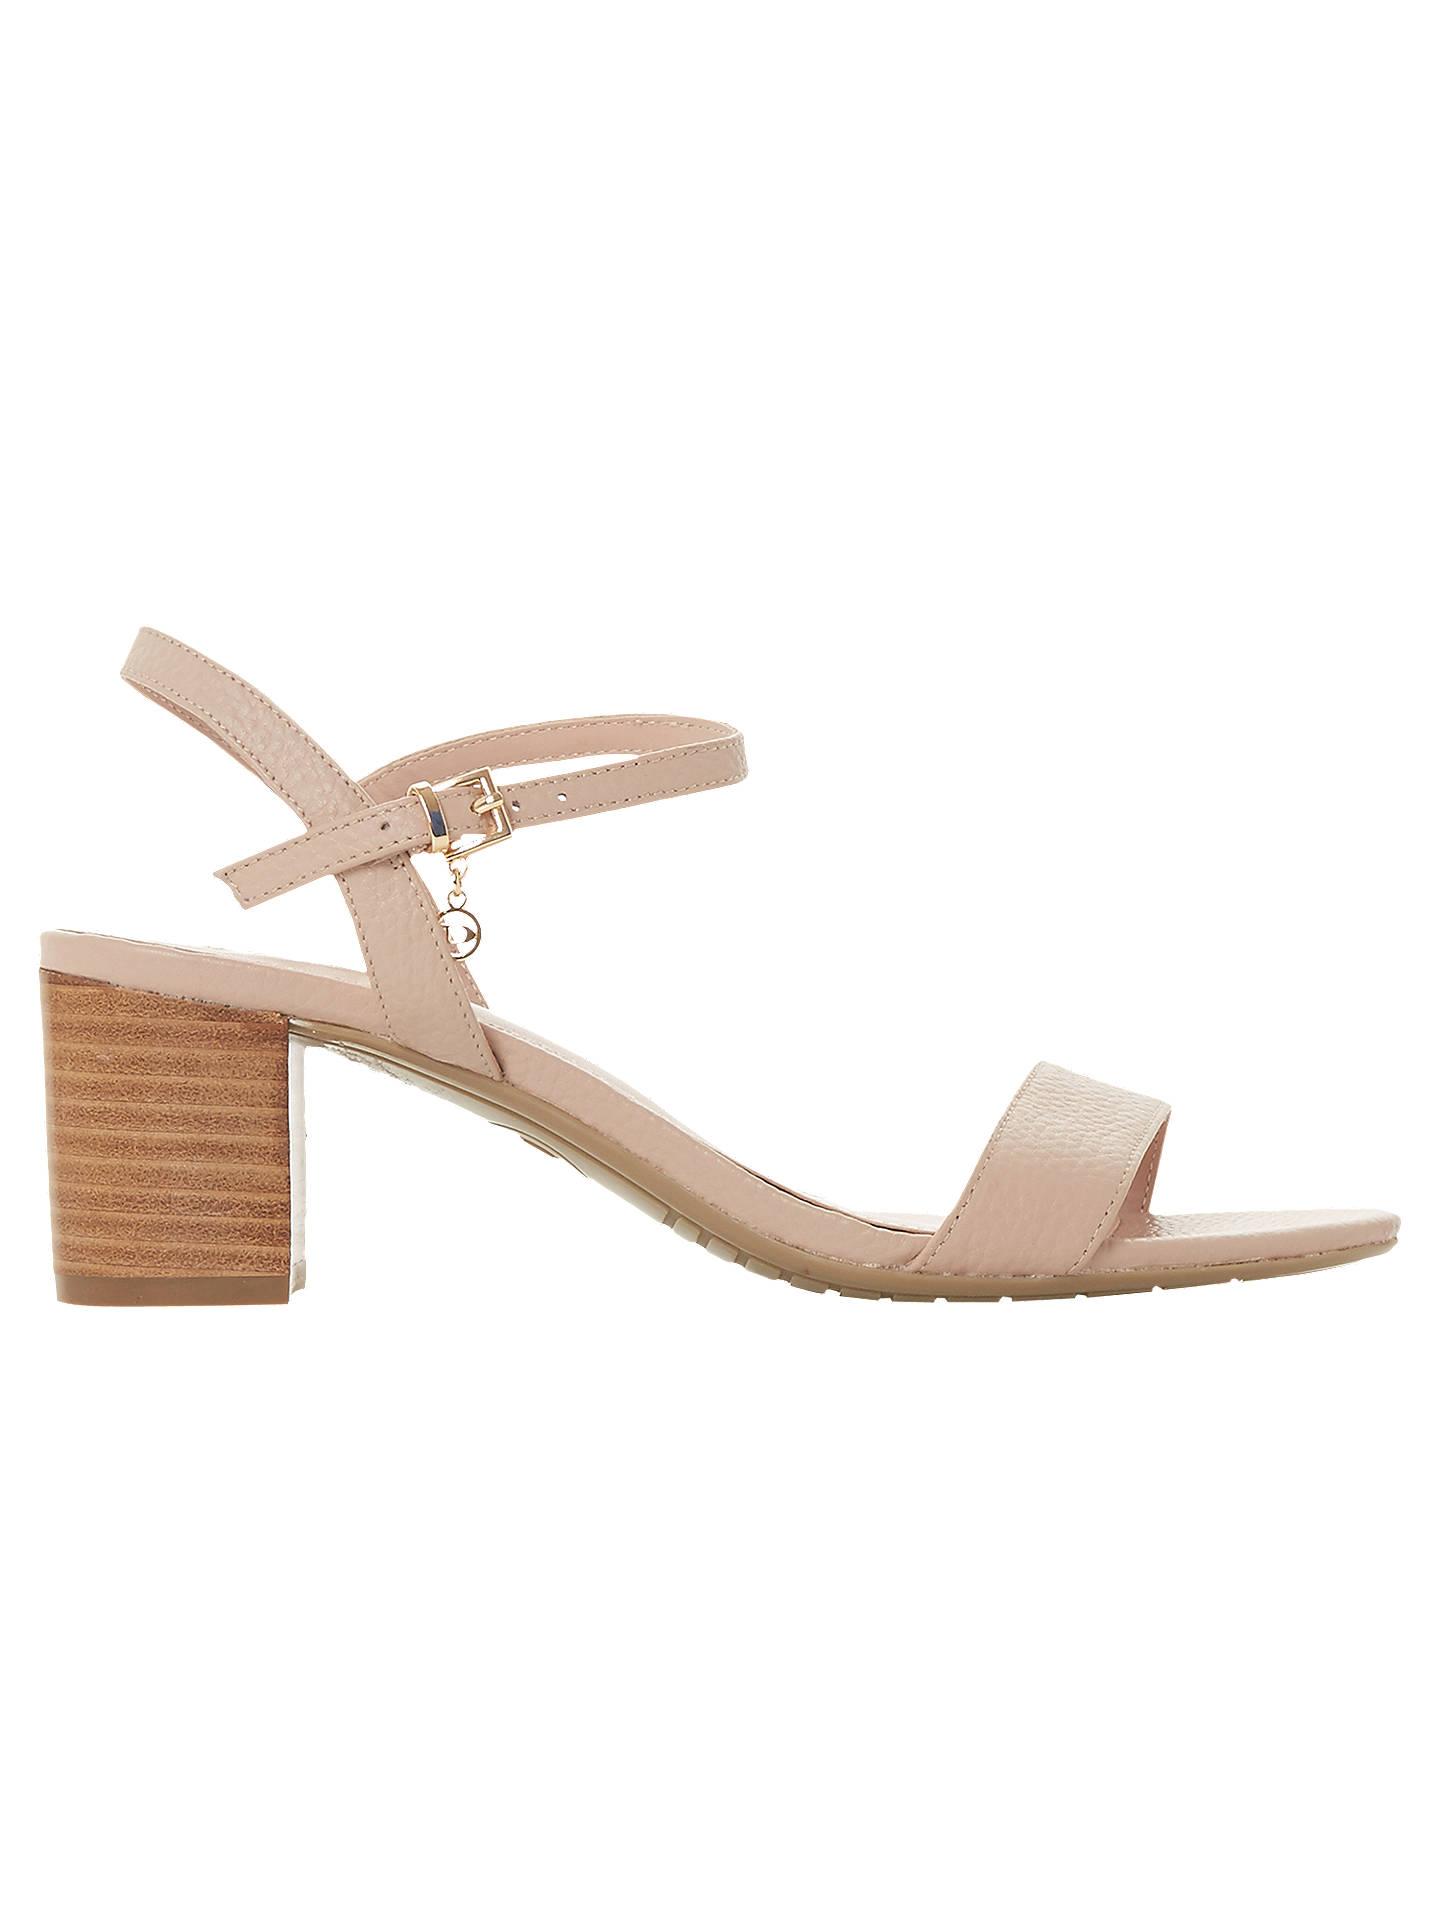 690480bb0c2 Dune Jiggle Block Heel Sandals at John Lewis   Partners